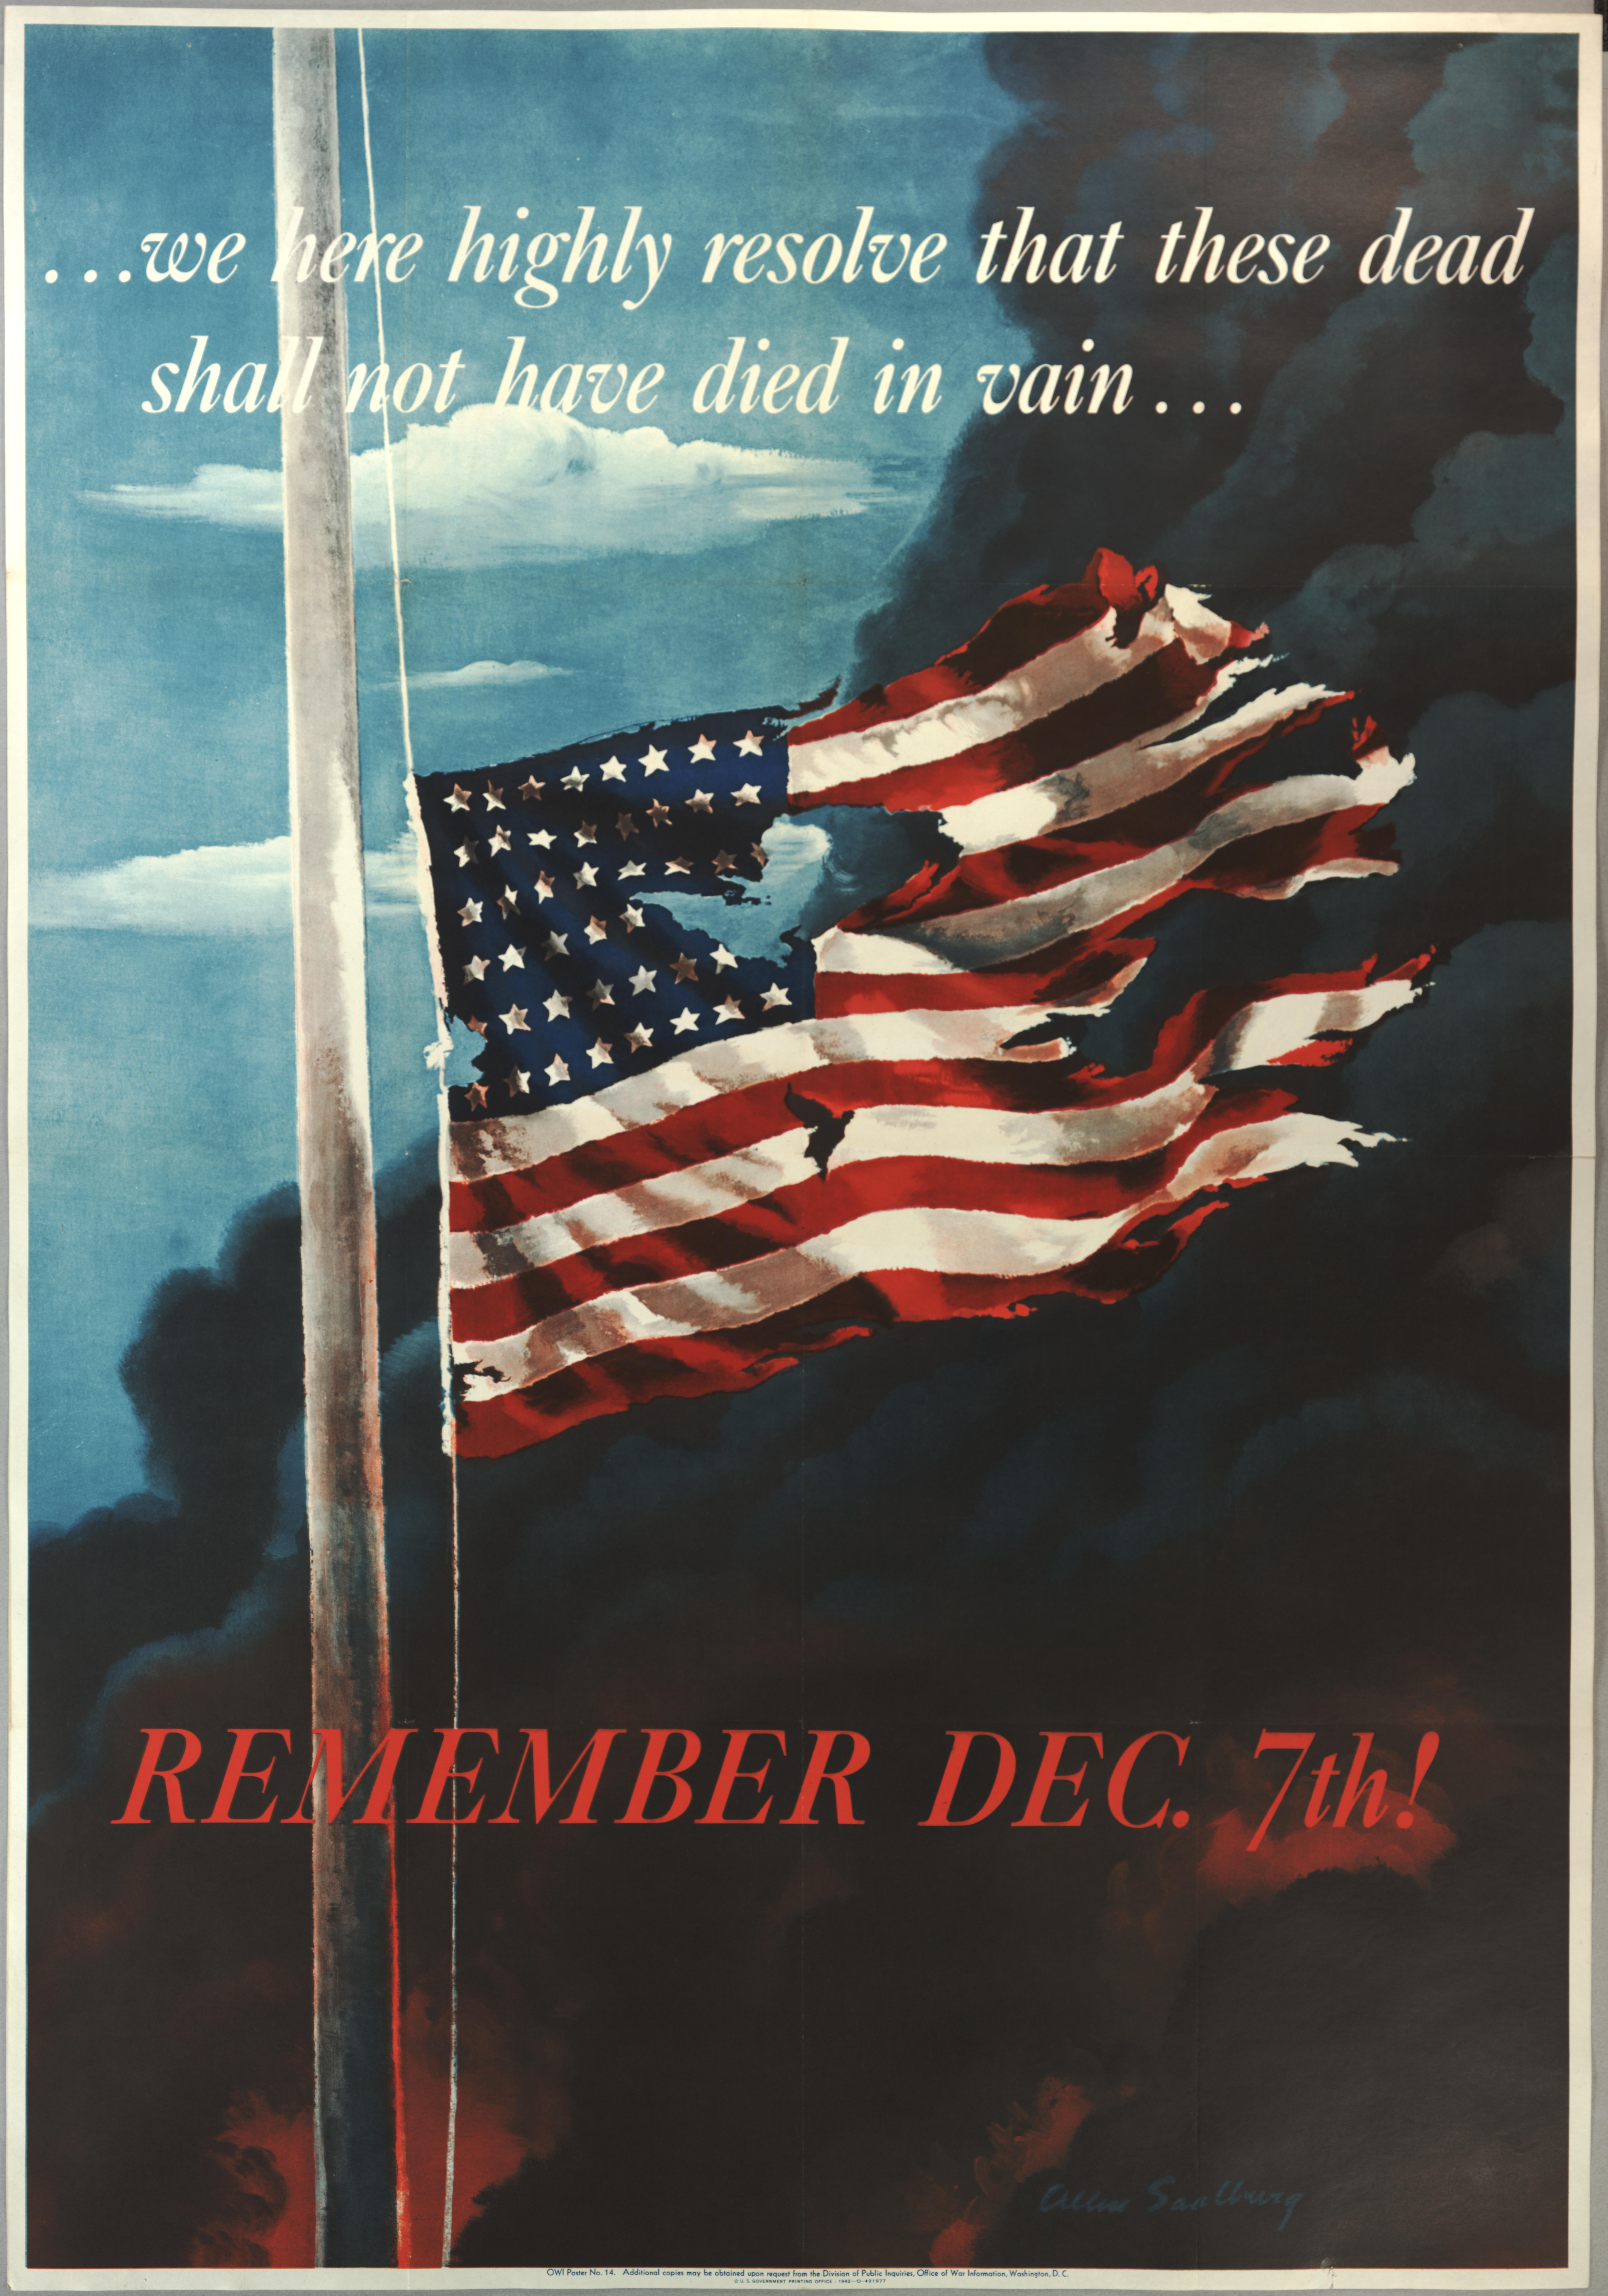 Remember Dec. 7th! Office of War Information, 1942. (GLC09520.08)